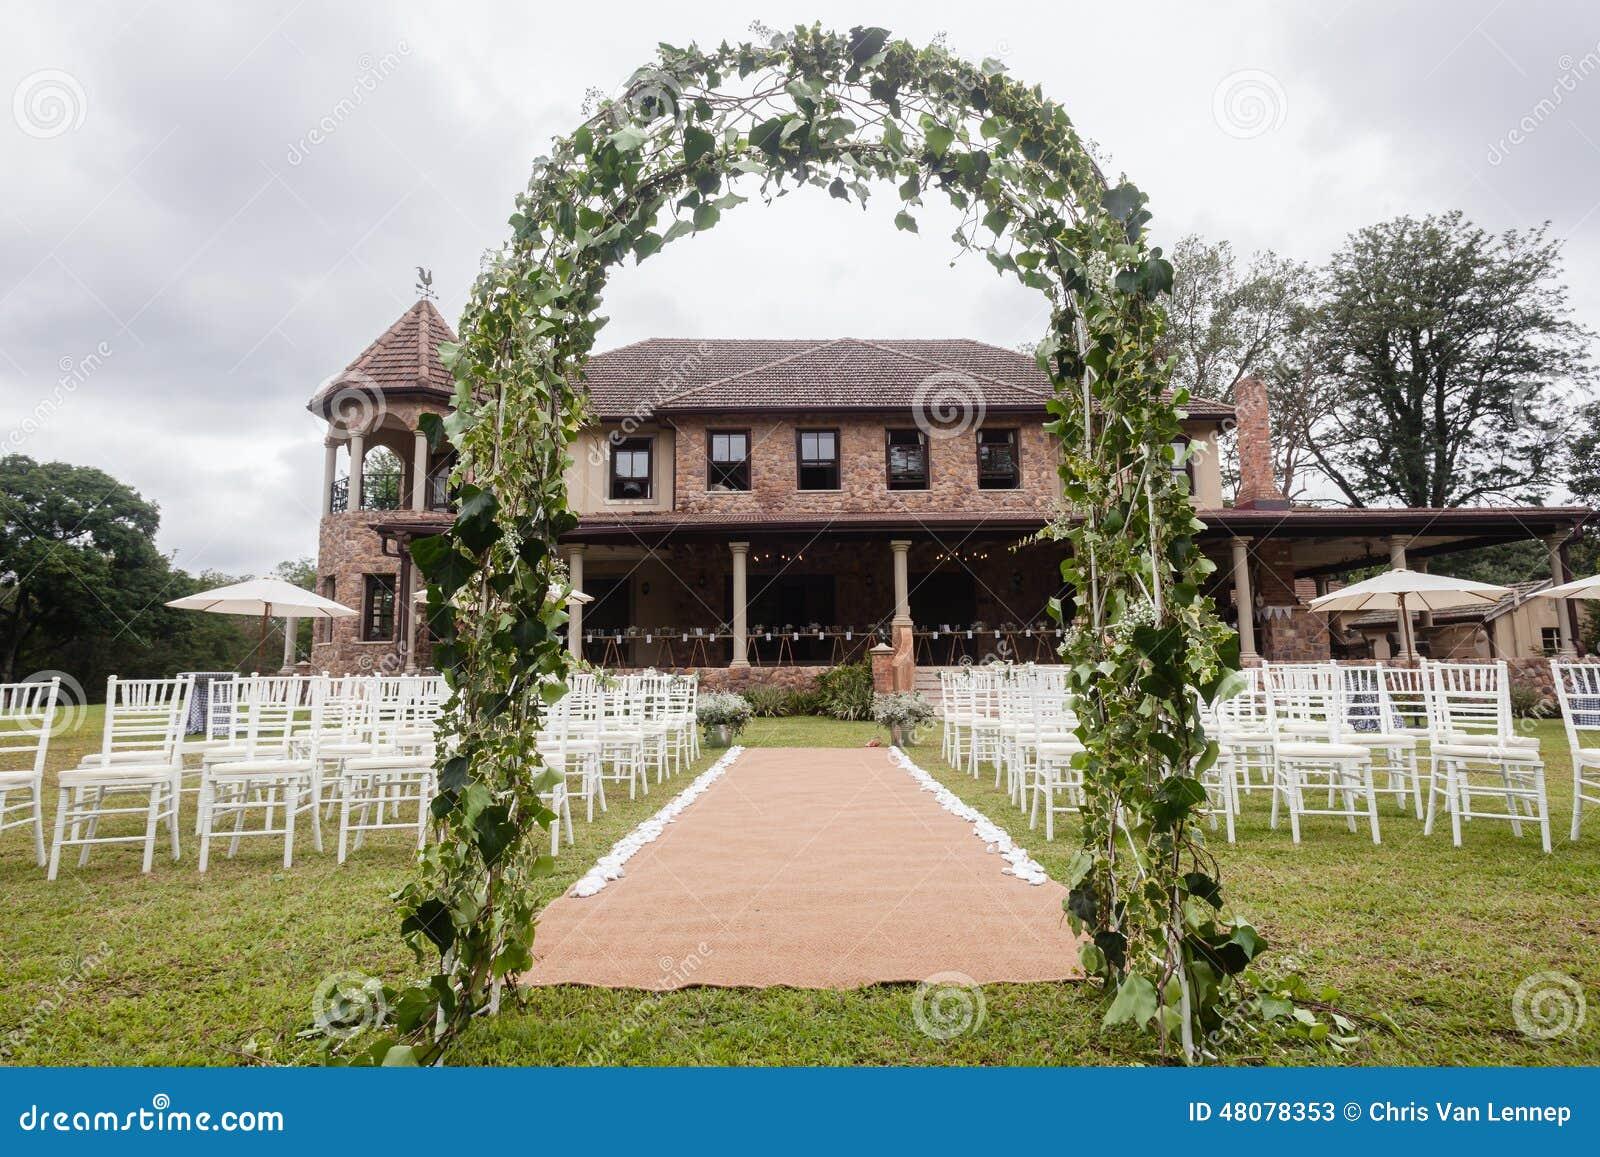 wedding thumbs home